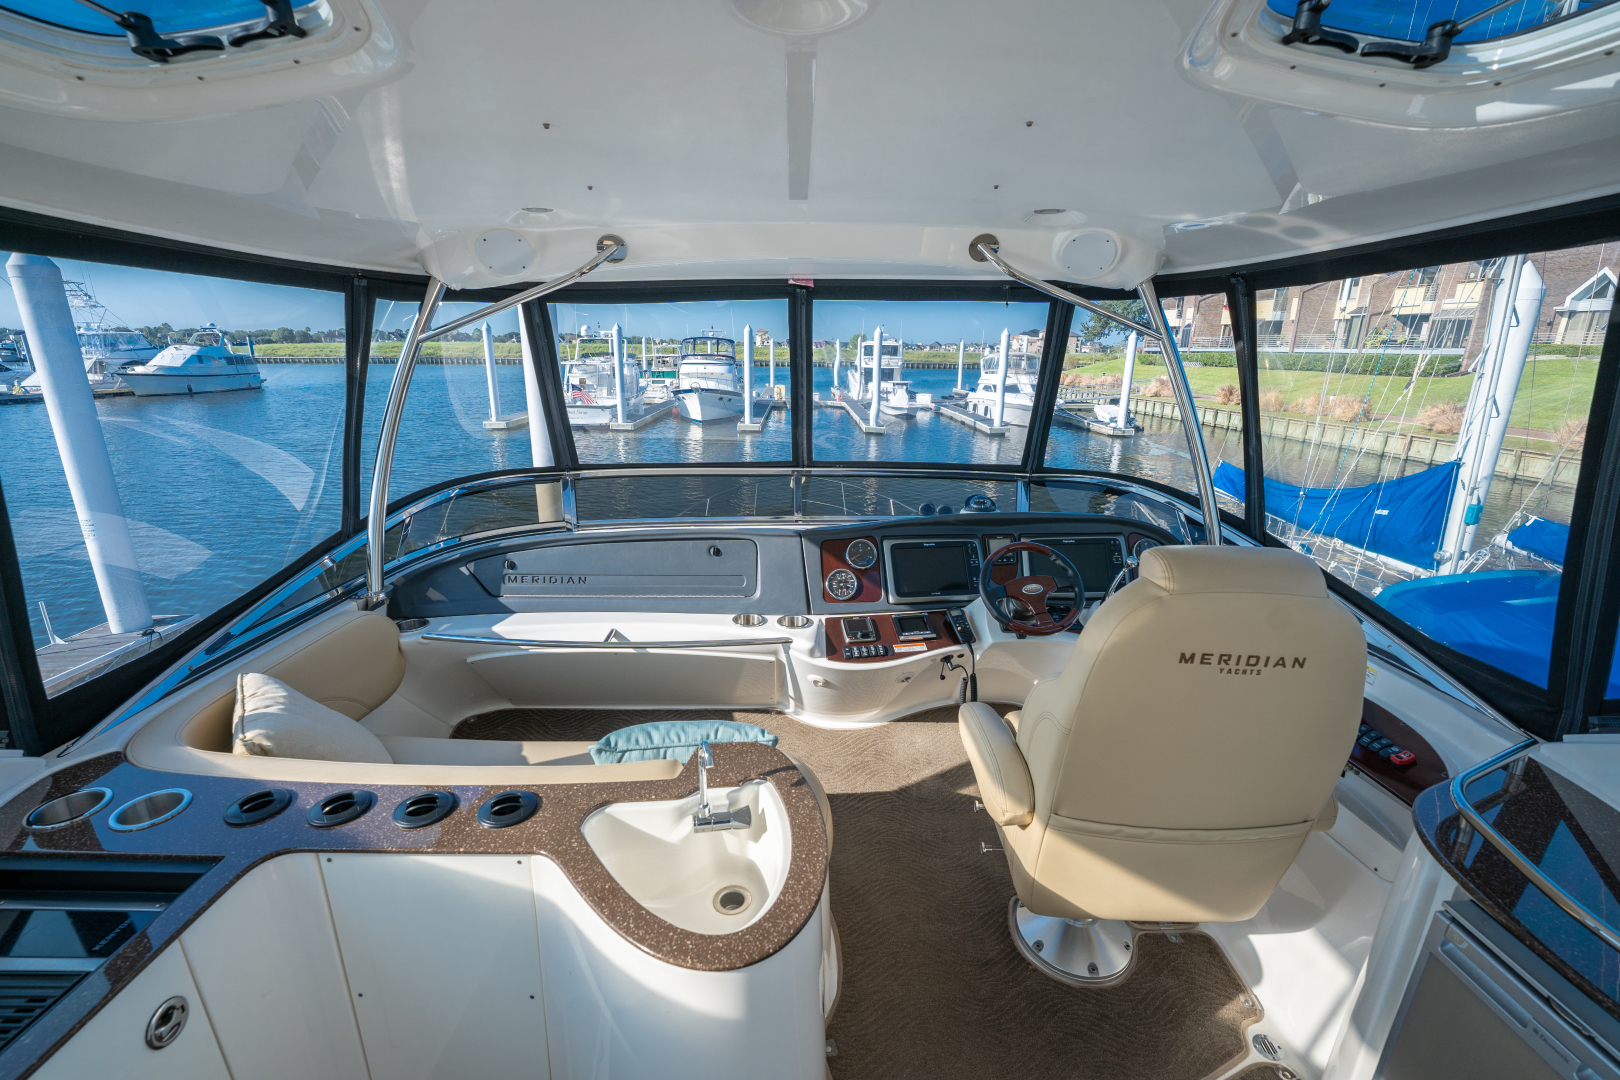 Meridian-441 Motor Yacht 2016-Friend Ship League City-Texas-United States-Meridian 441 2016 Friend Ship-1508182 | Thumbnail